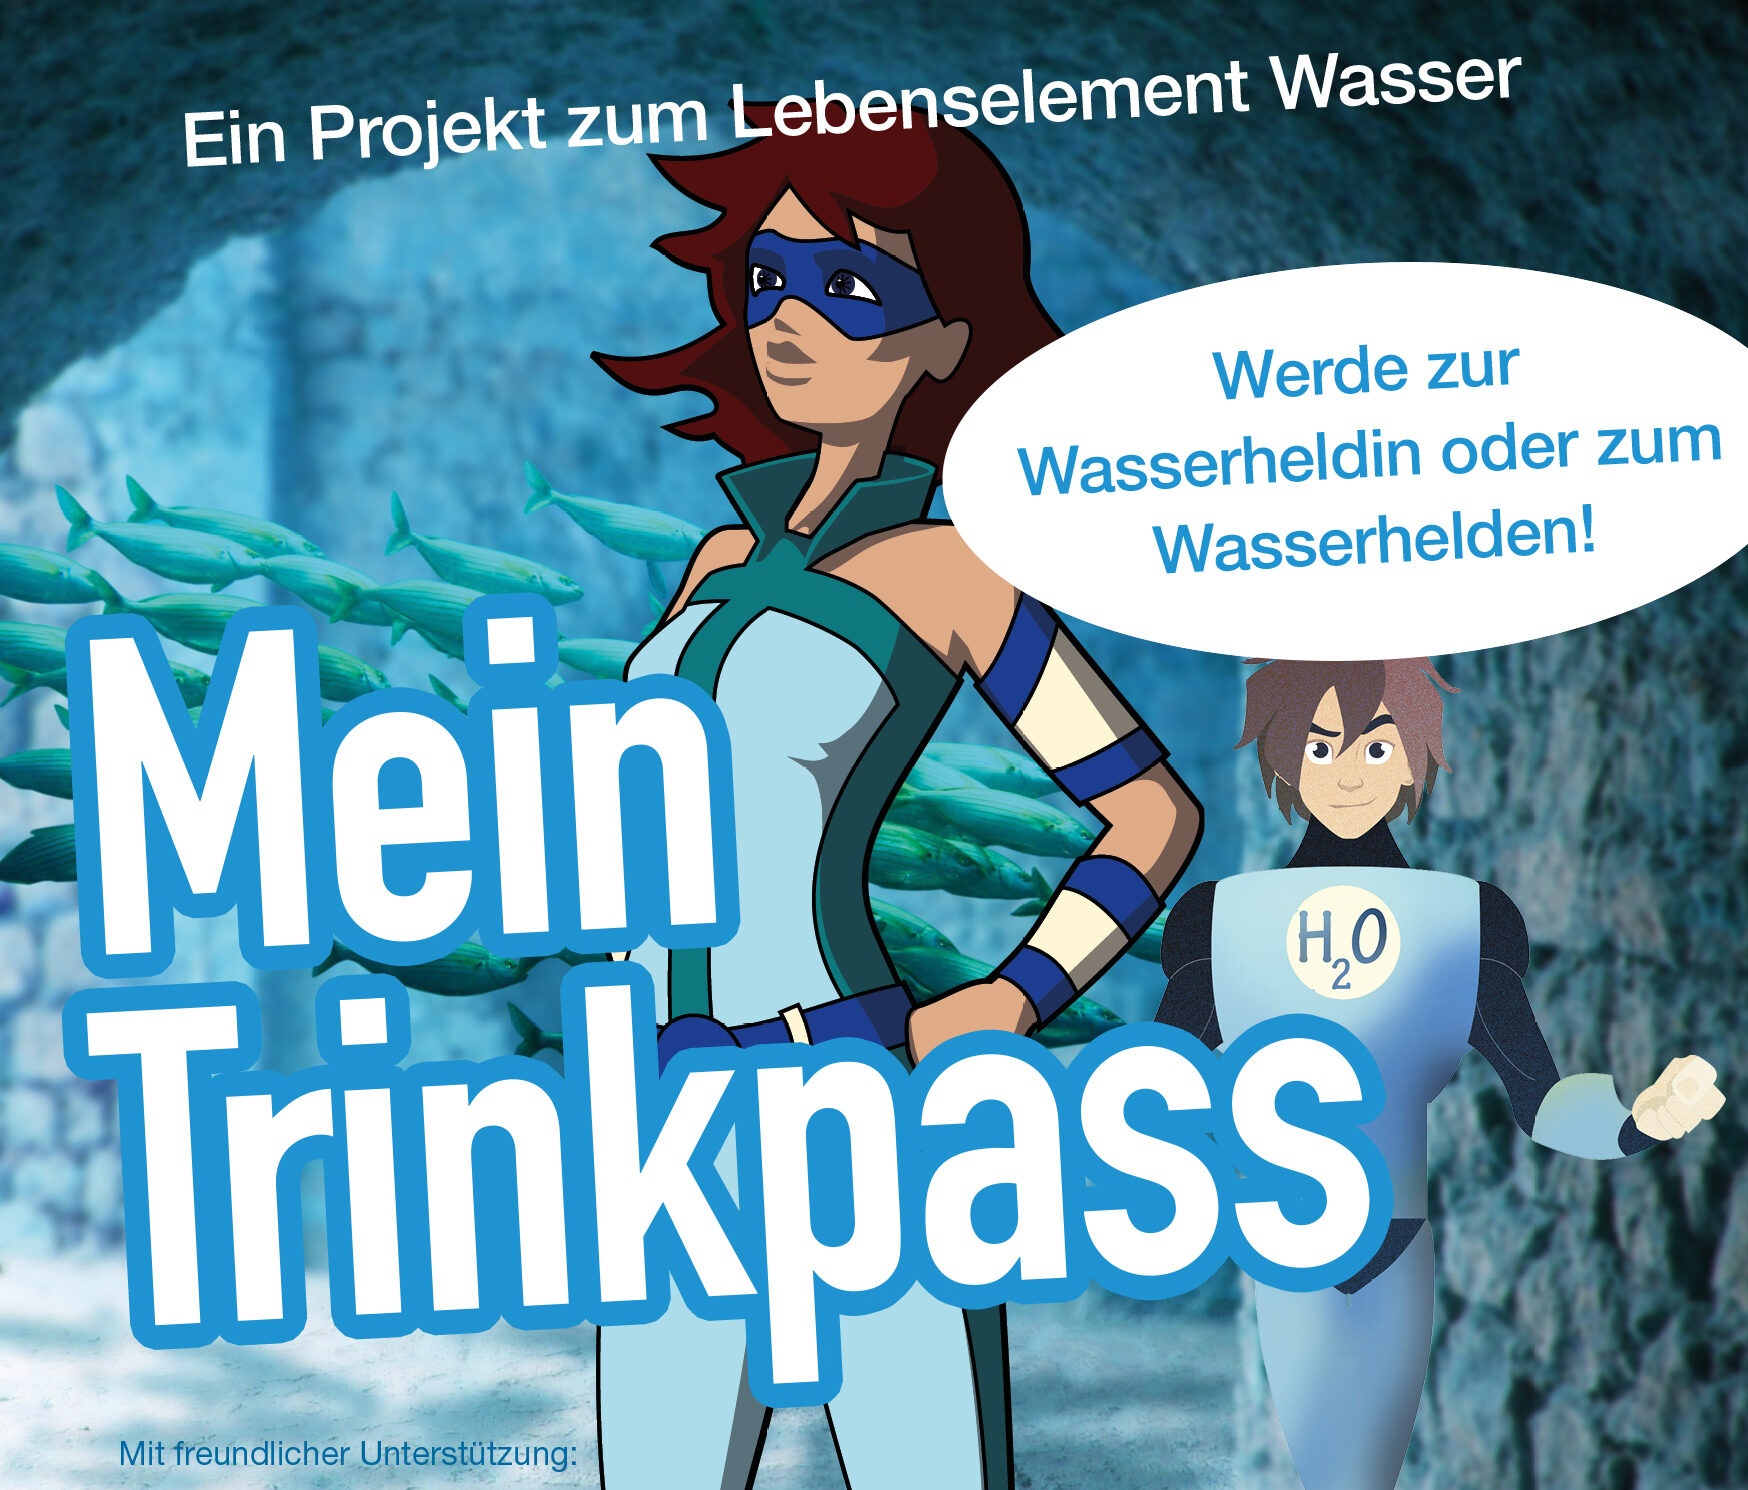 Trinkpass 2018